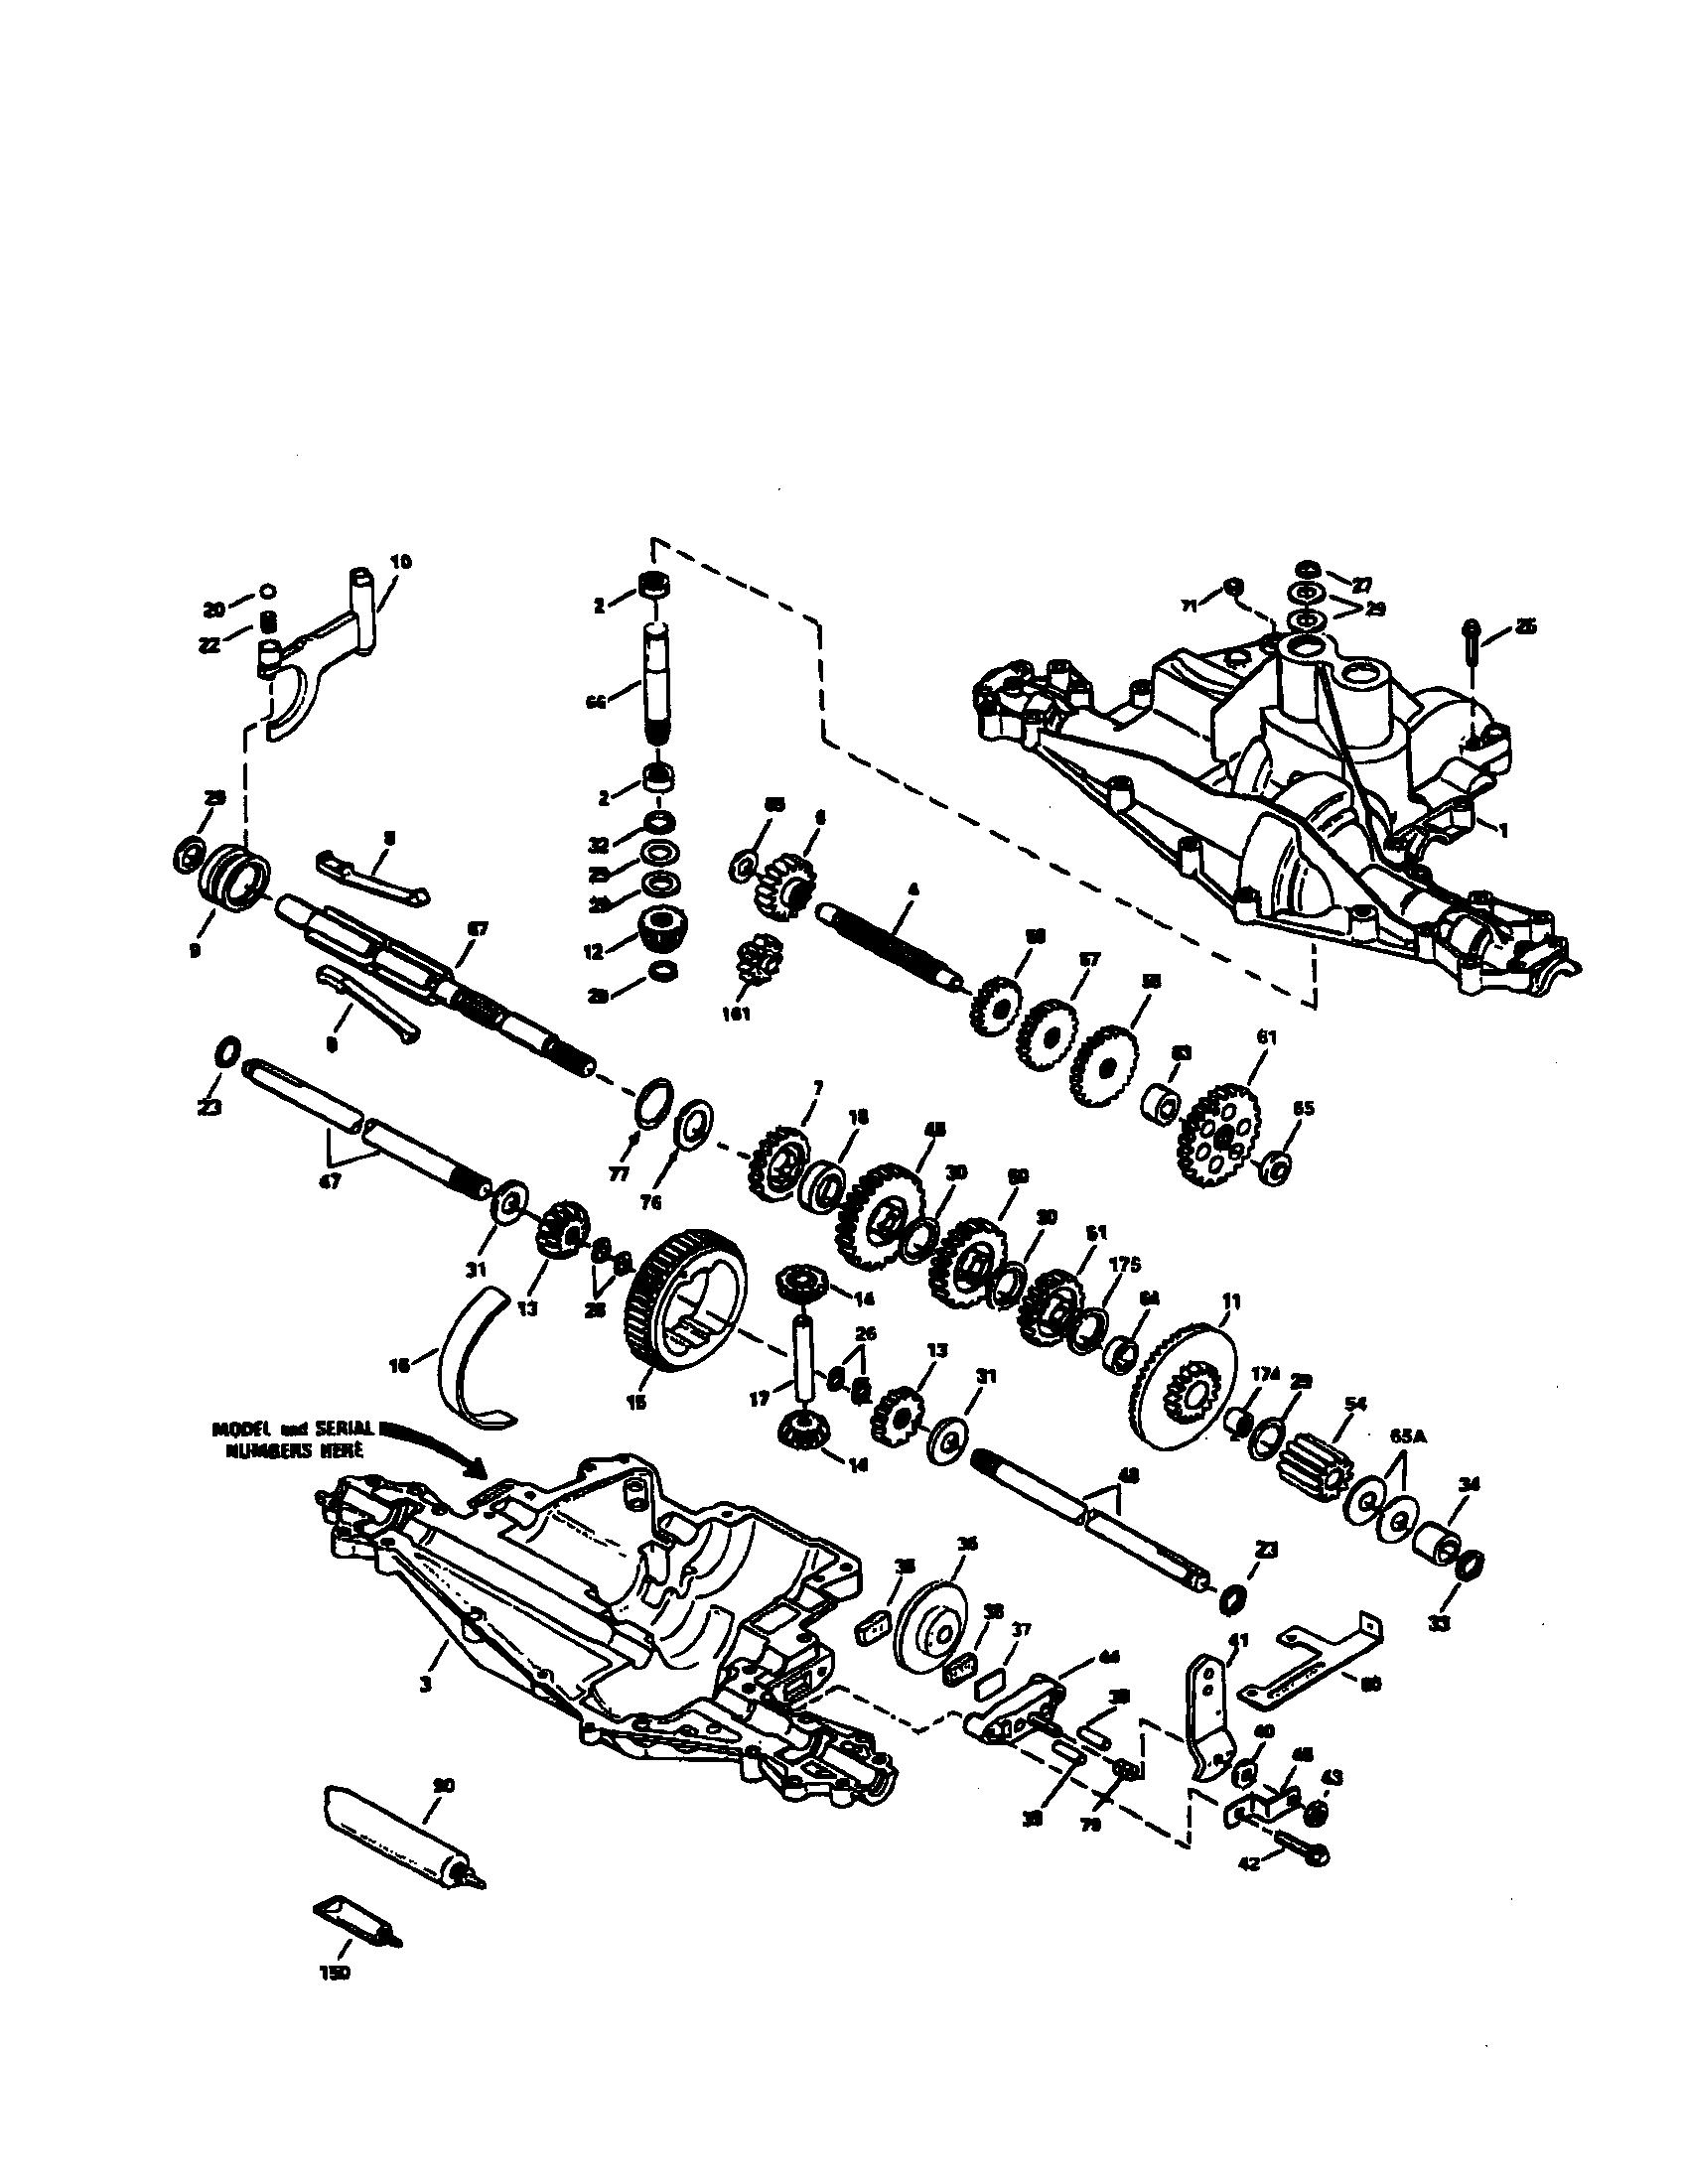 Craftsman Gt5000 Drive Belt Diagram